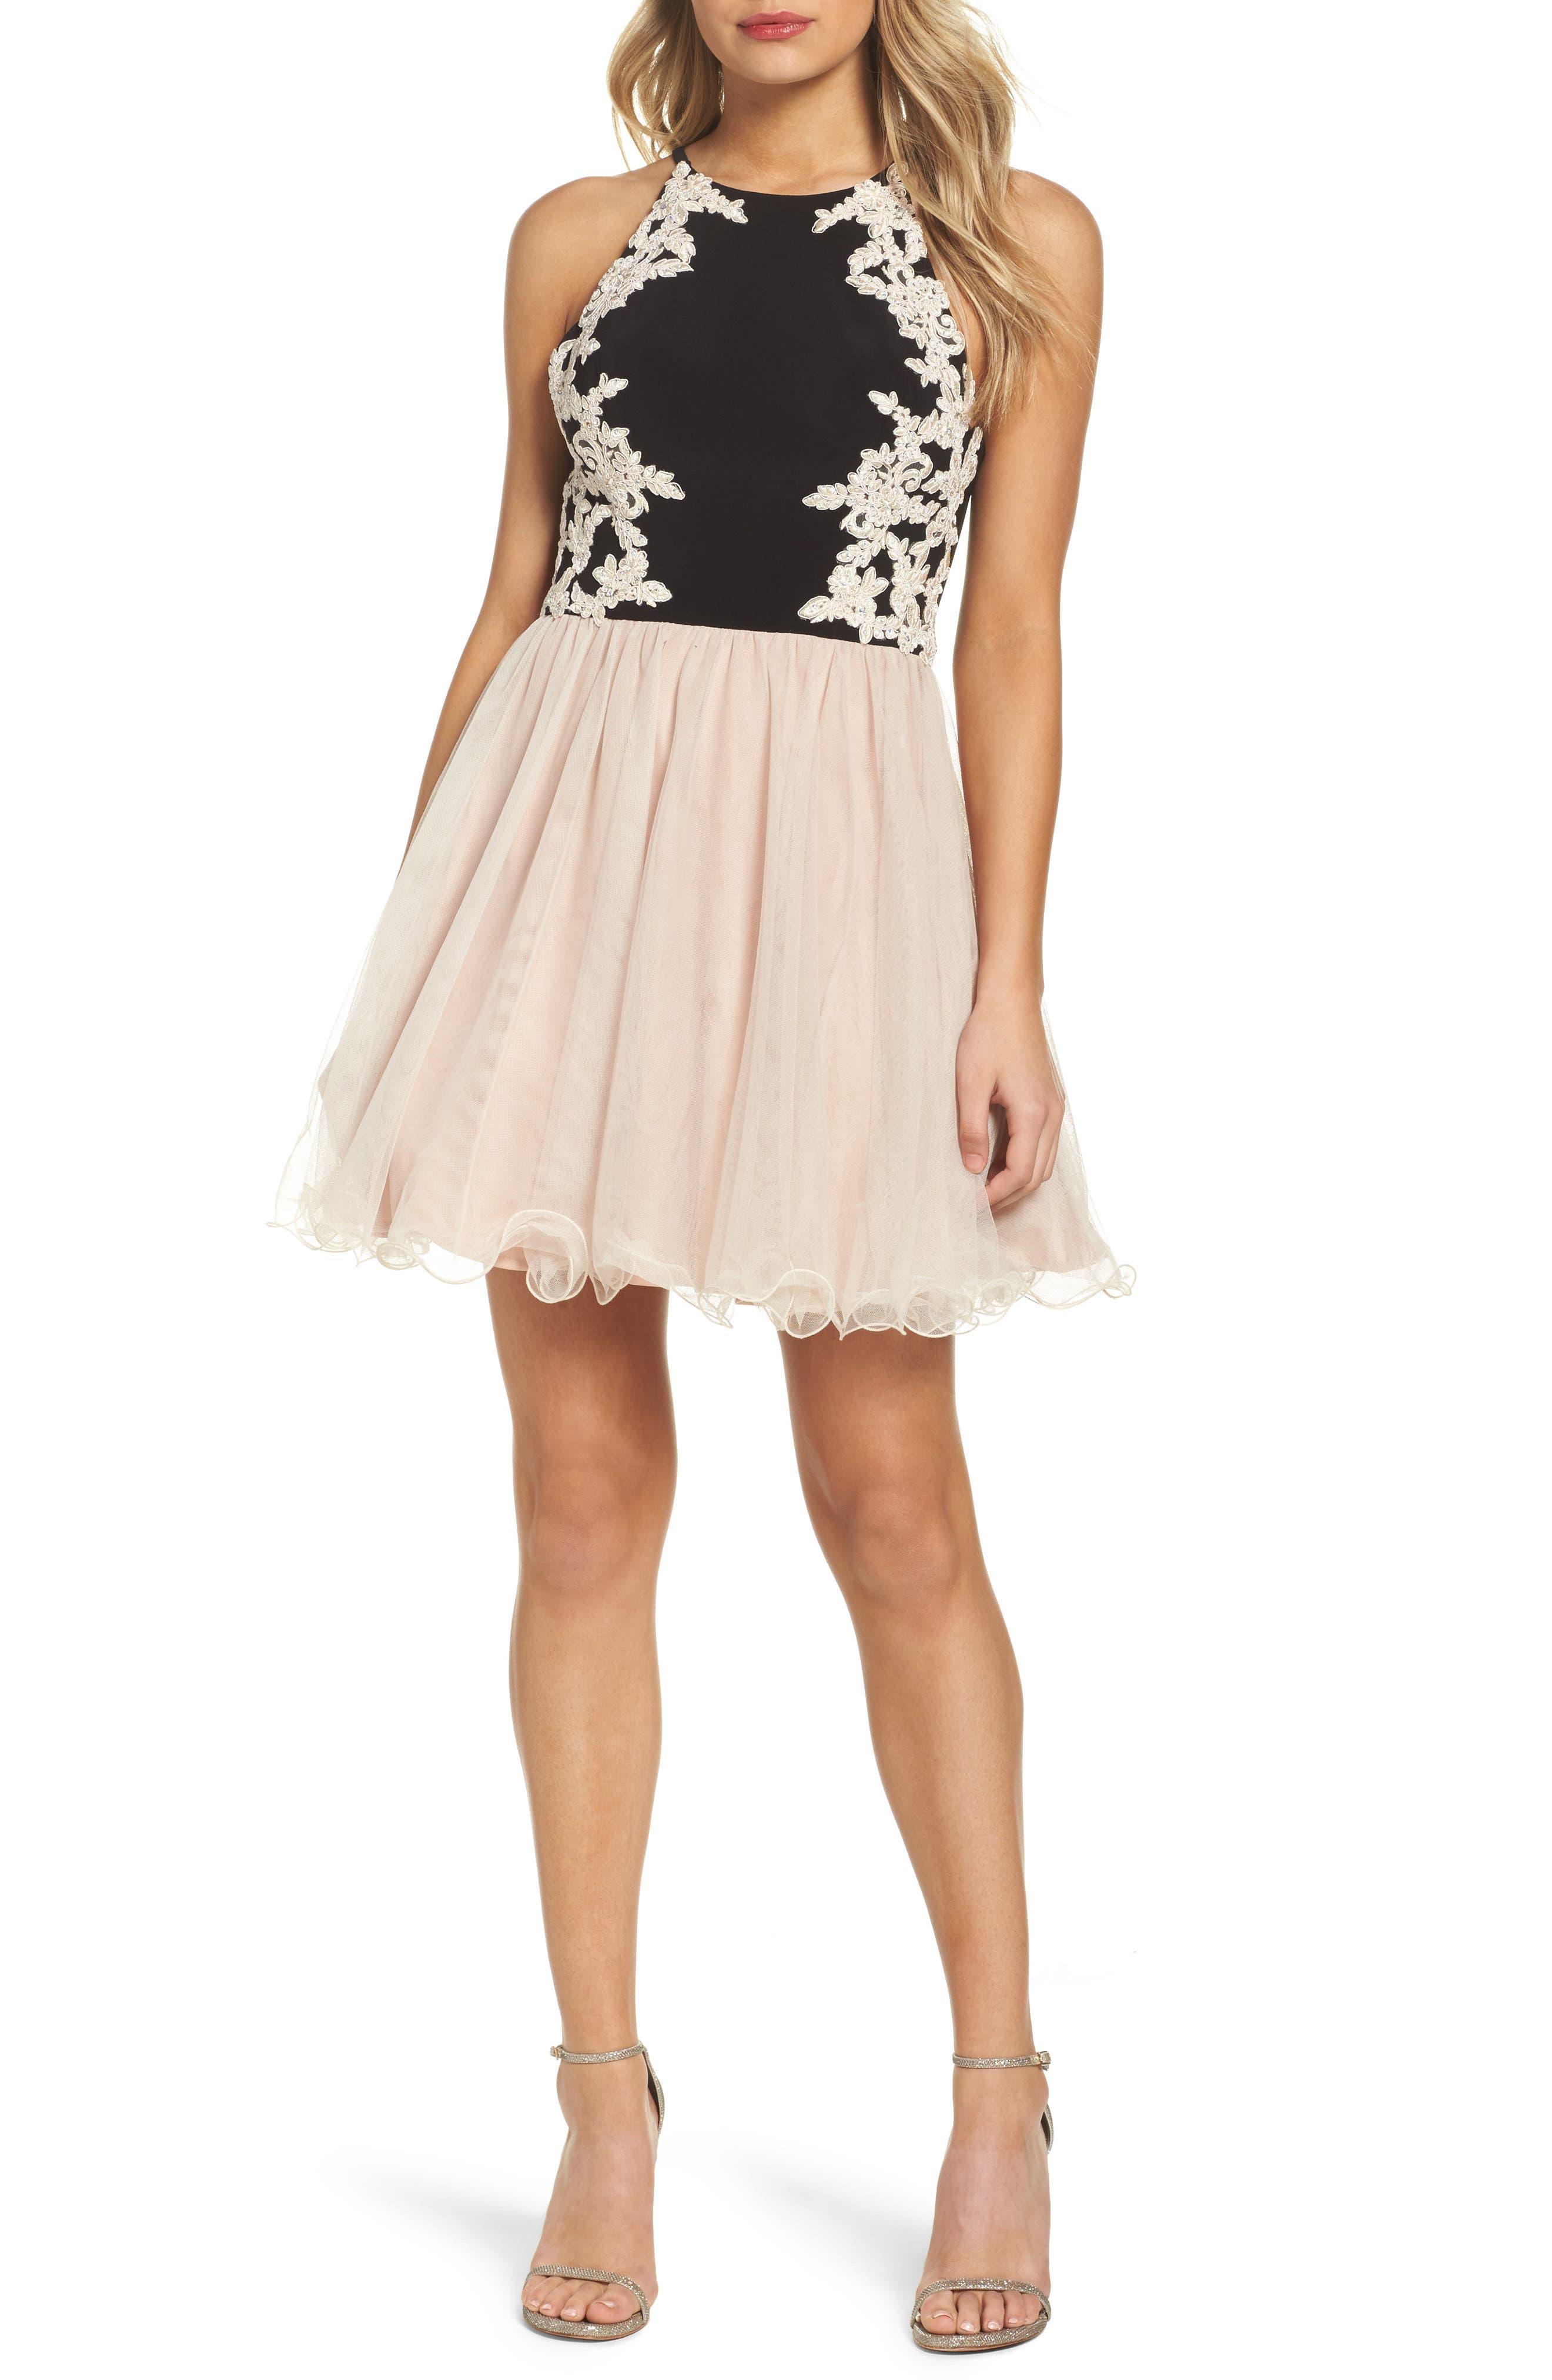 Blondie Nites Appliqué Fit & Flare Dress